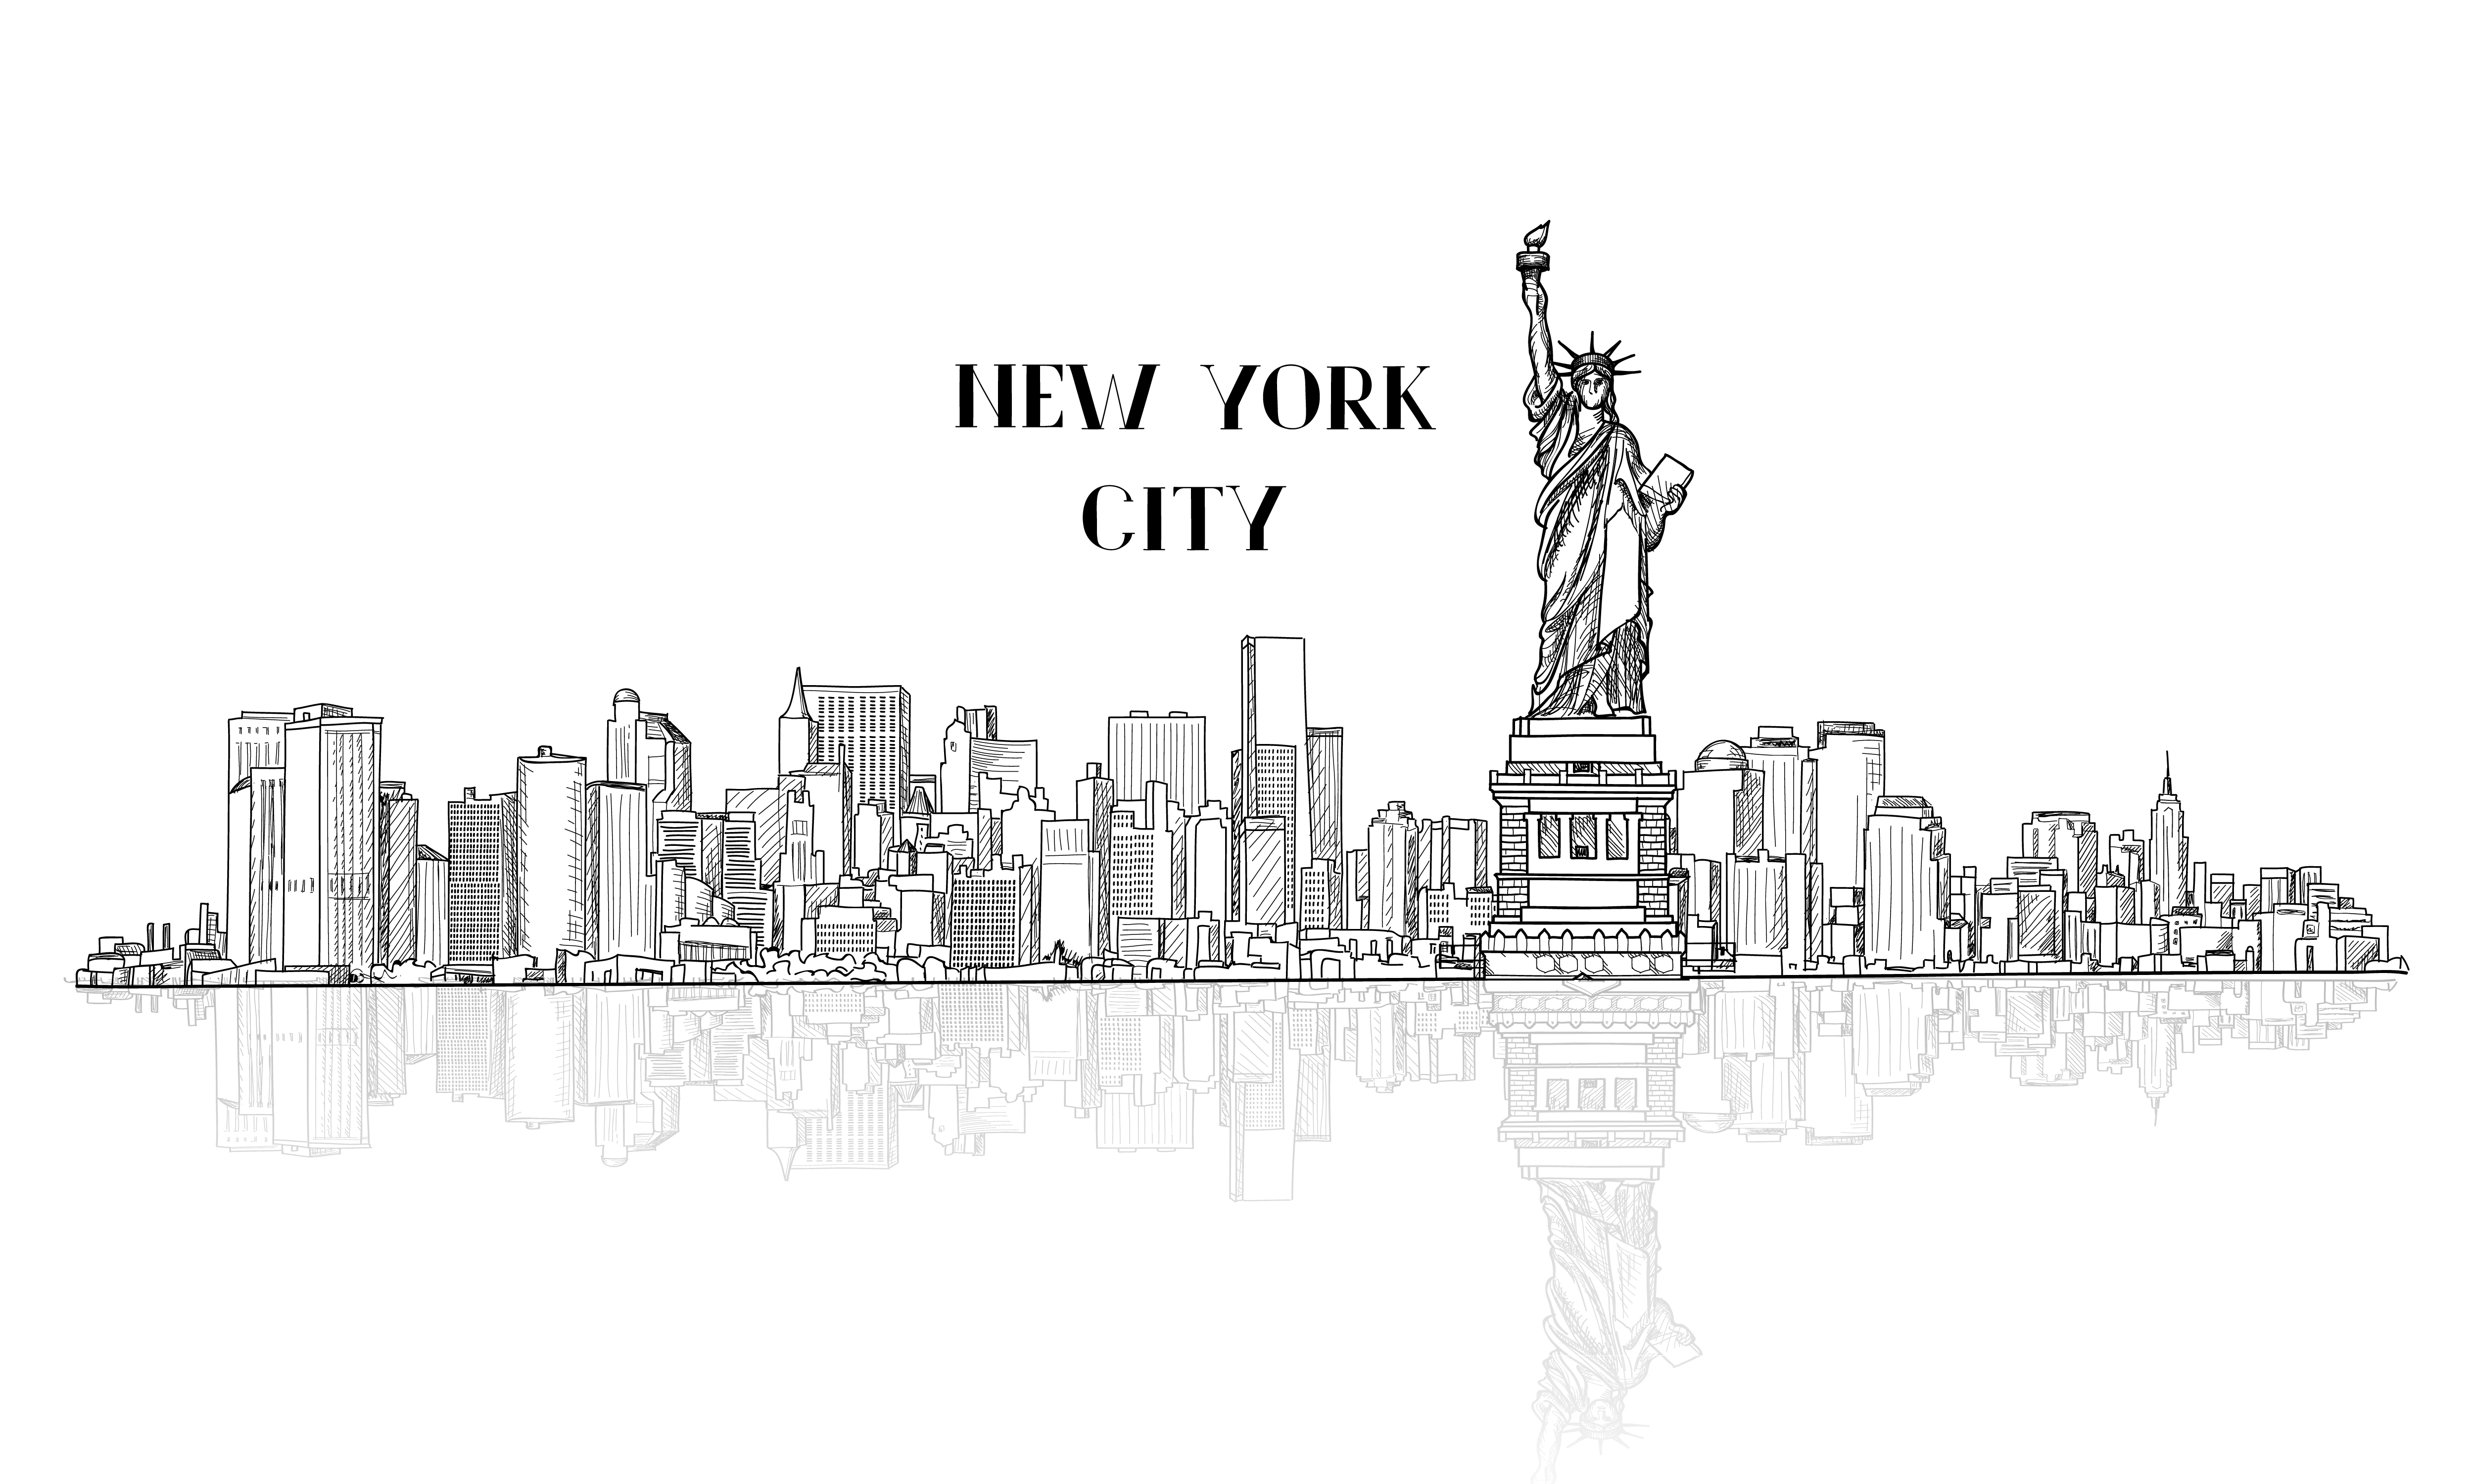 new york usa skyline city silhouette with liberty